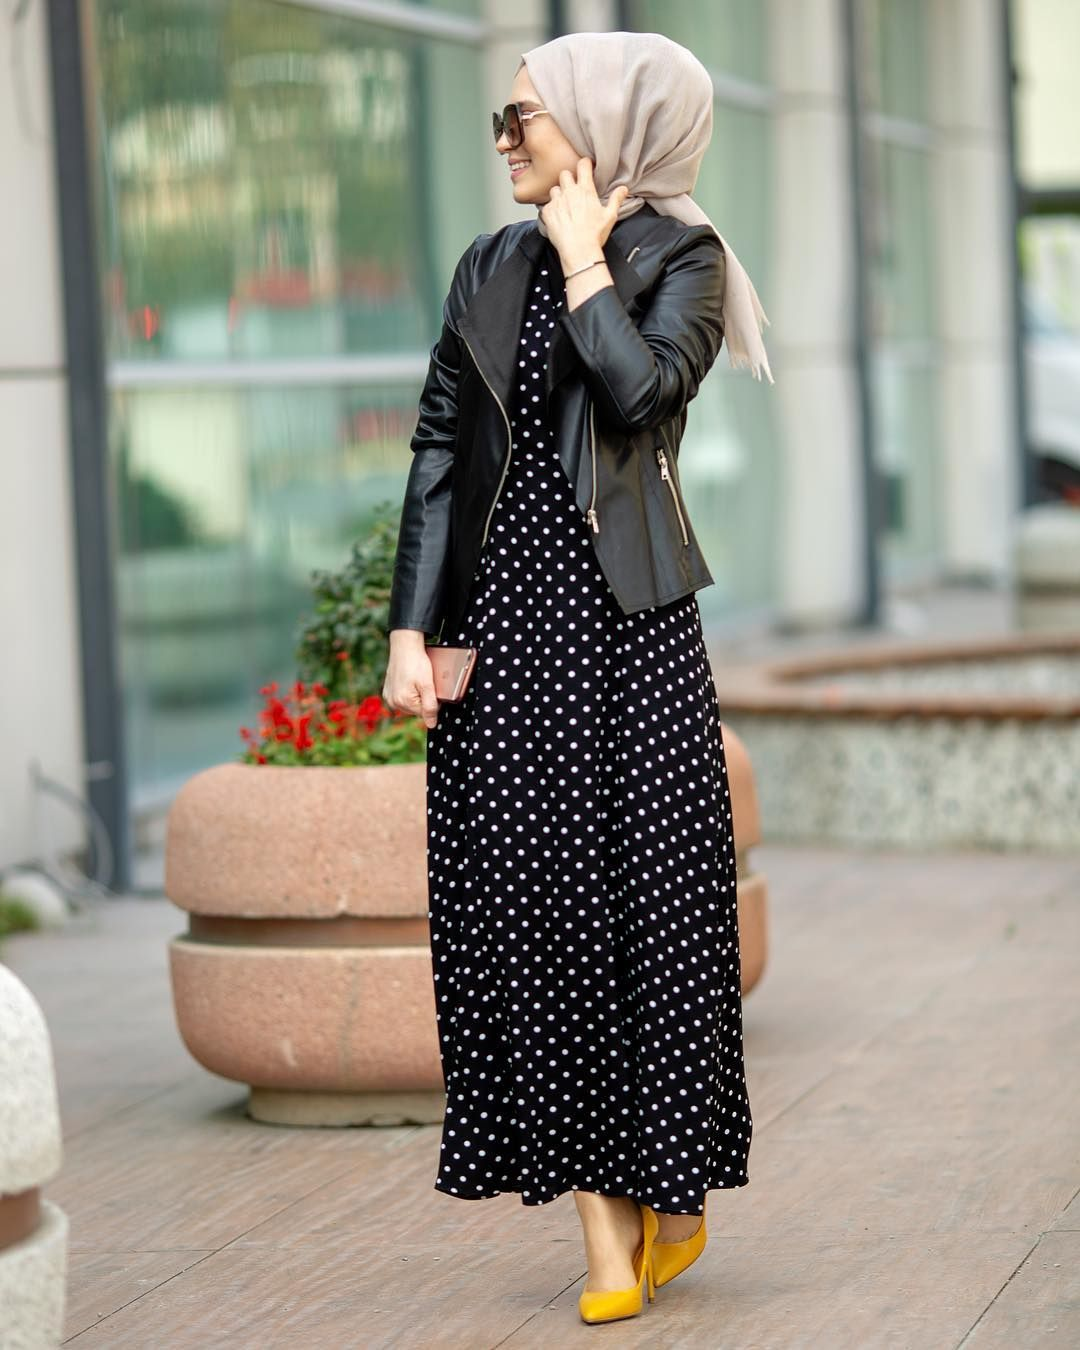 6 686 Begenme 280 Yorum Instagram Da Esra Kekulluoglu Esrakekulluogluuuu Ceket Ve Puantiyel Modest Fashion Hijab Muslim Fashion Dress Muslim Fashion